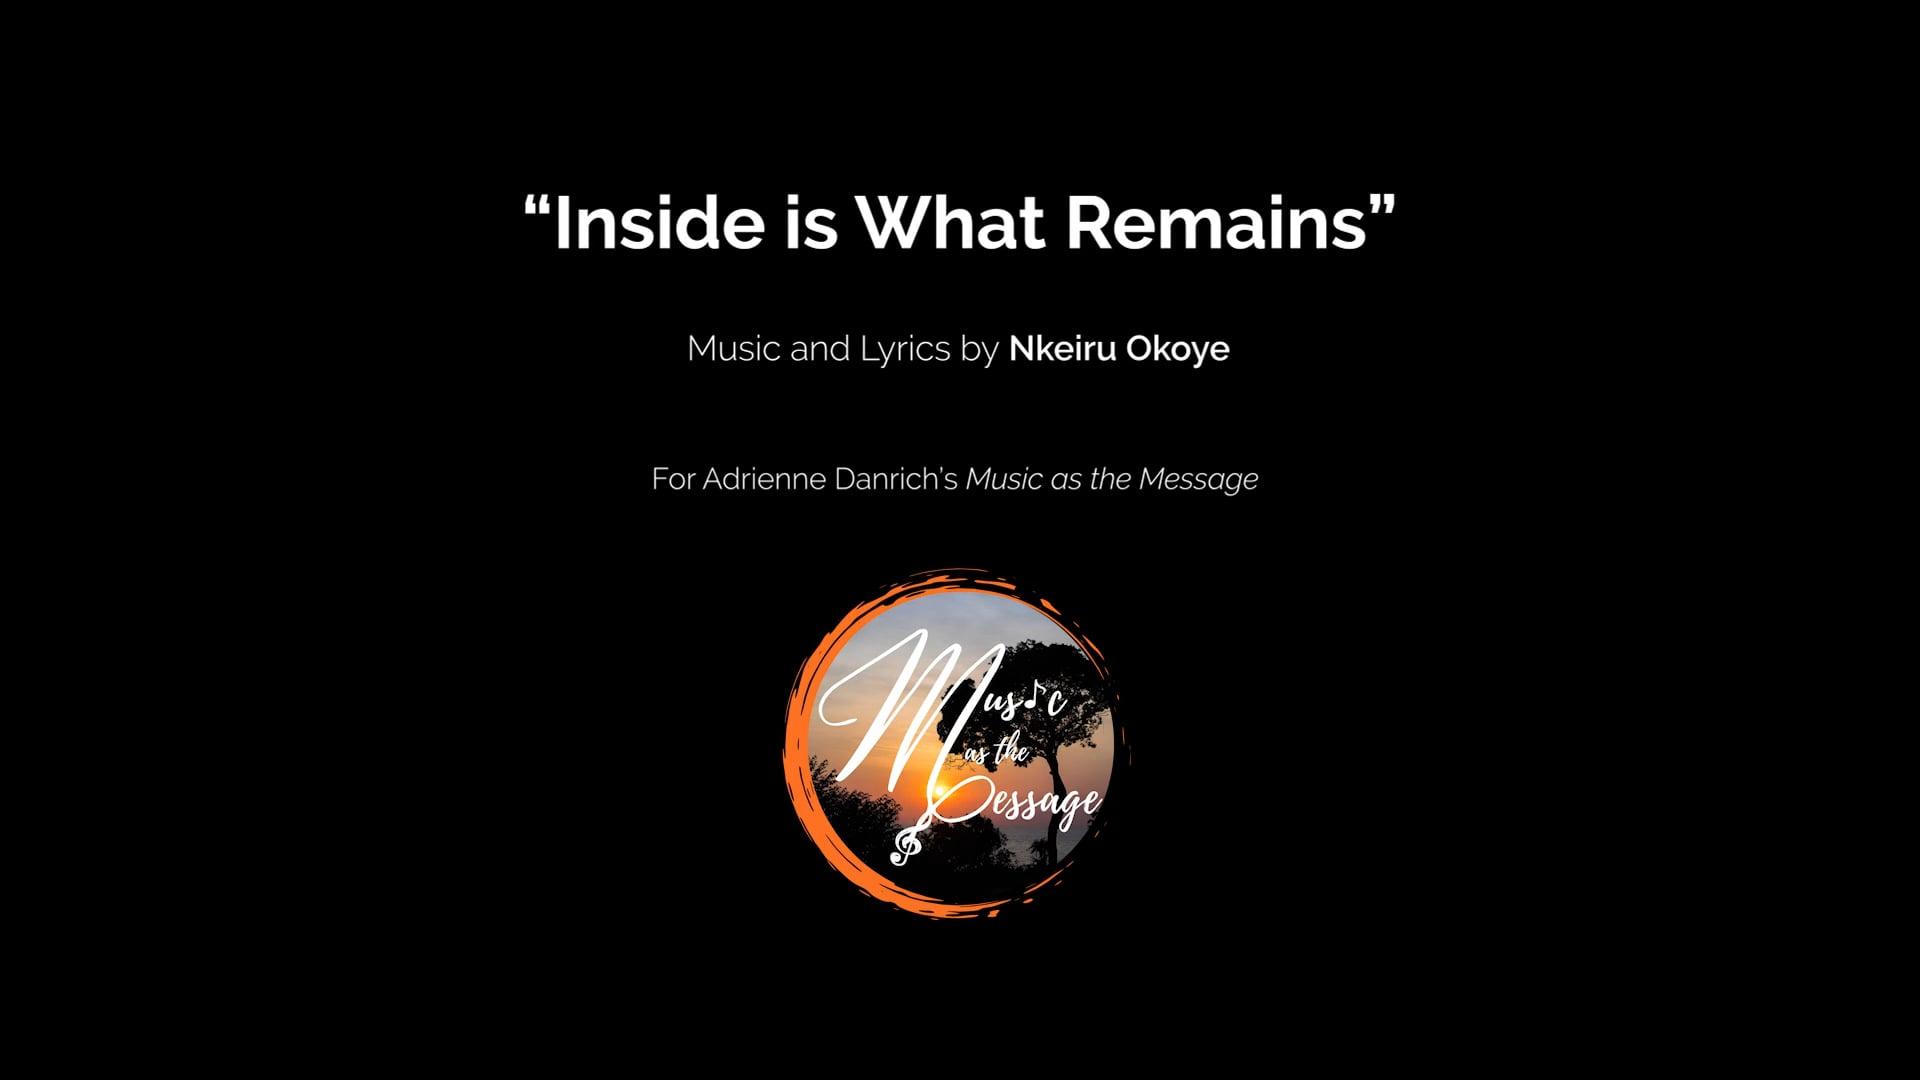 Inside is What Remains by Nkeiru Okoye